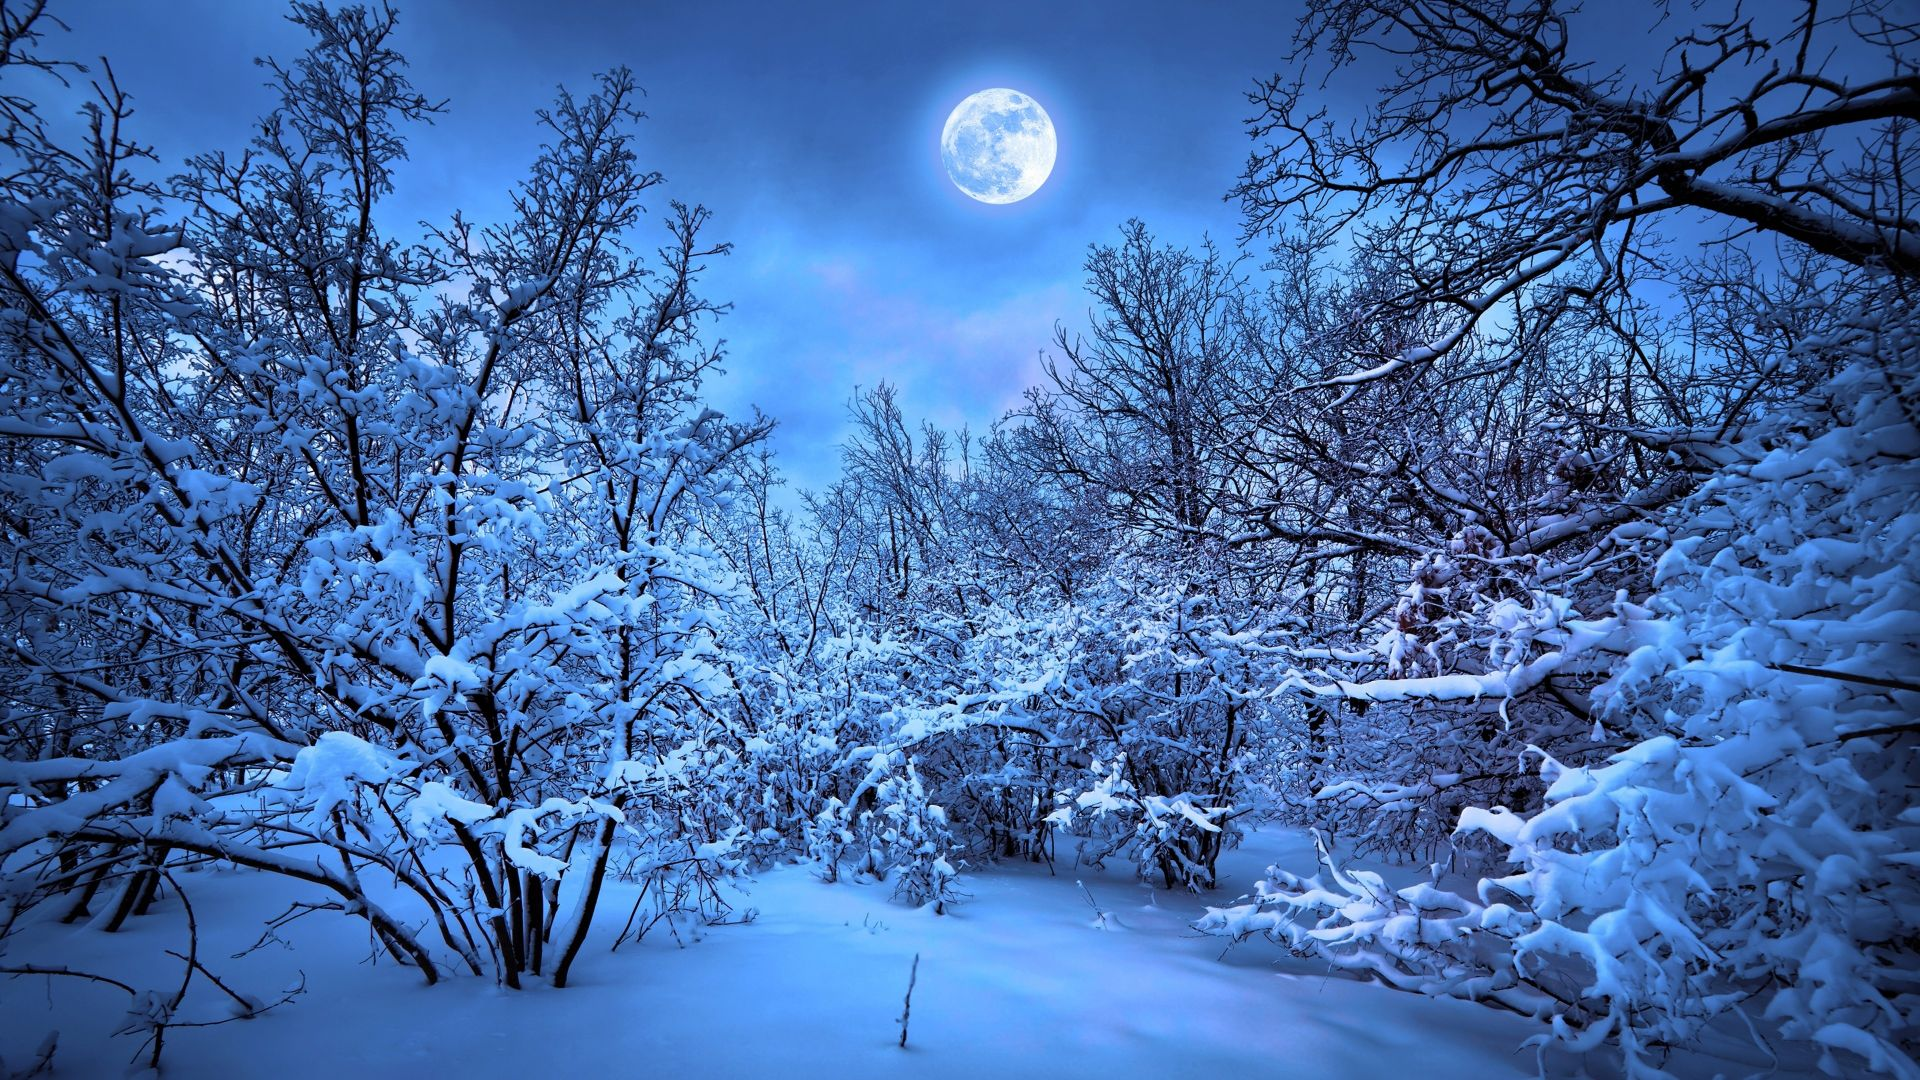 Desktop Wallpaper Winter Snow Moon Night Nature 4k Hd Image Picture Background 0c689f